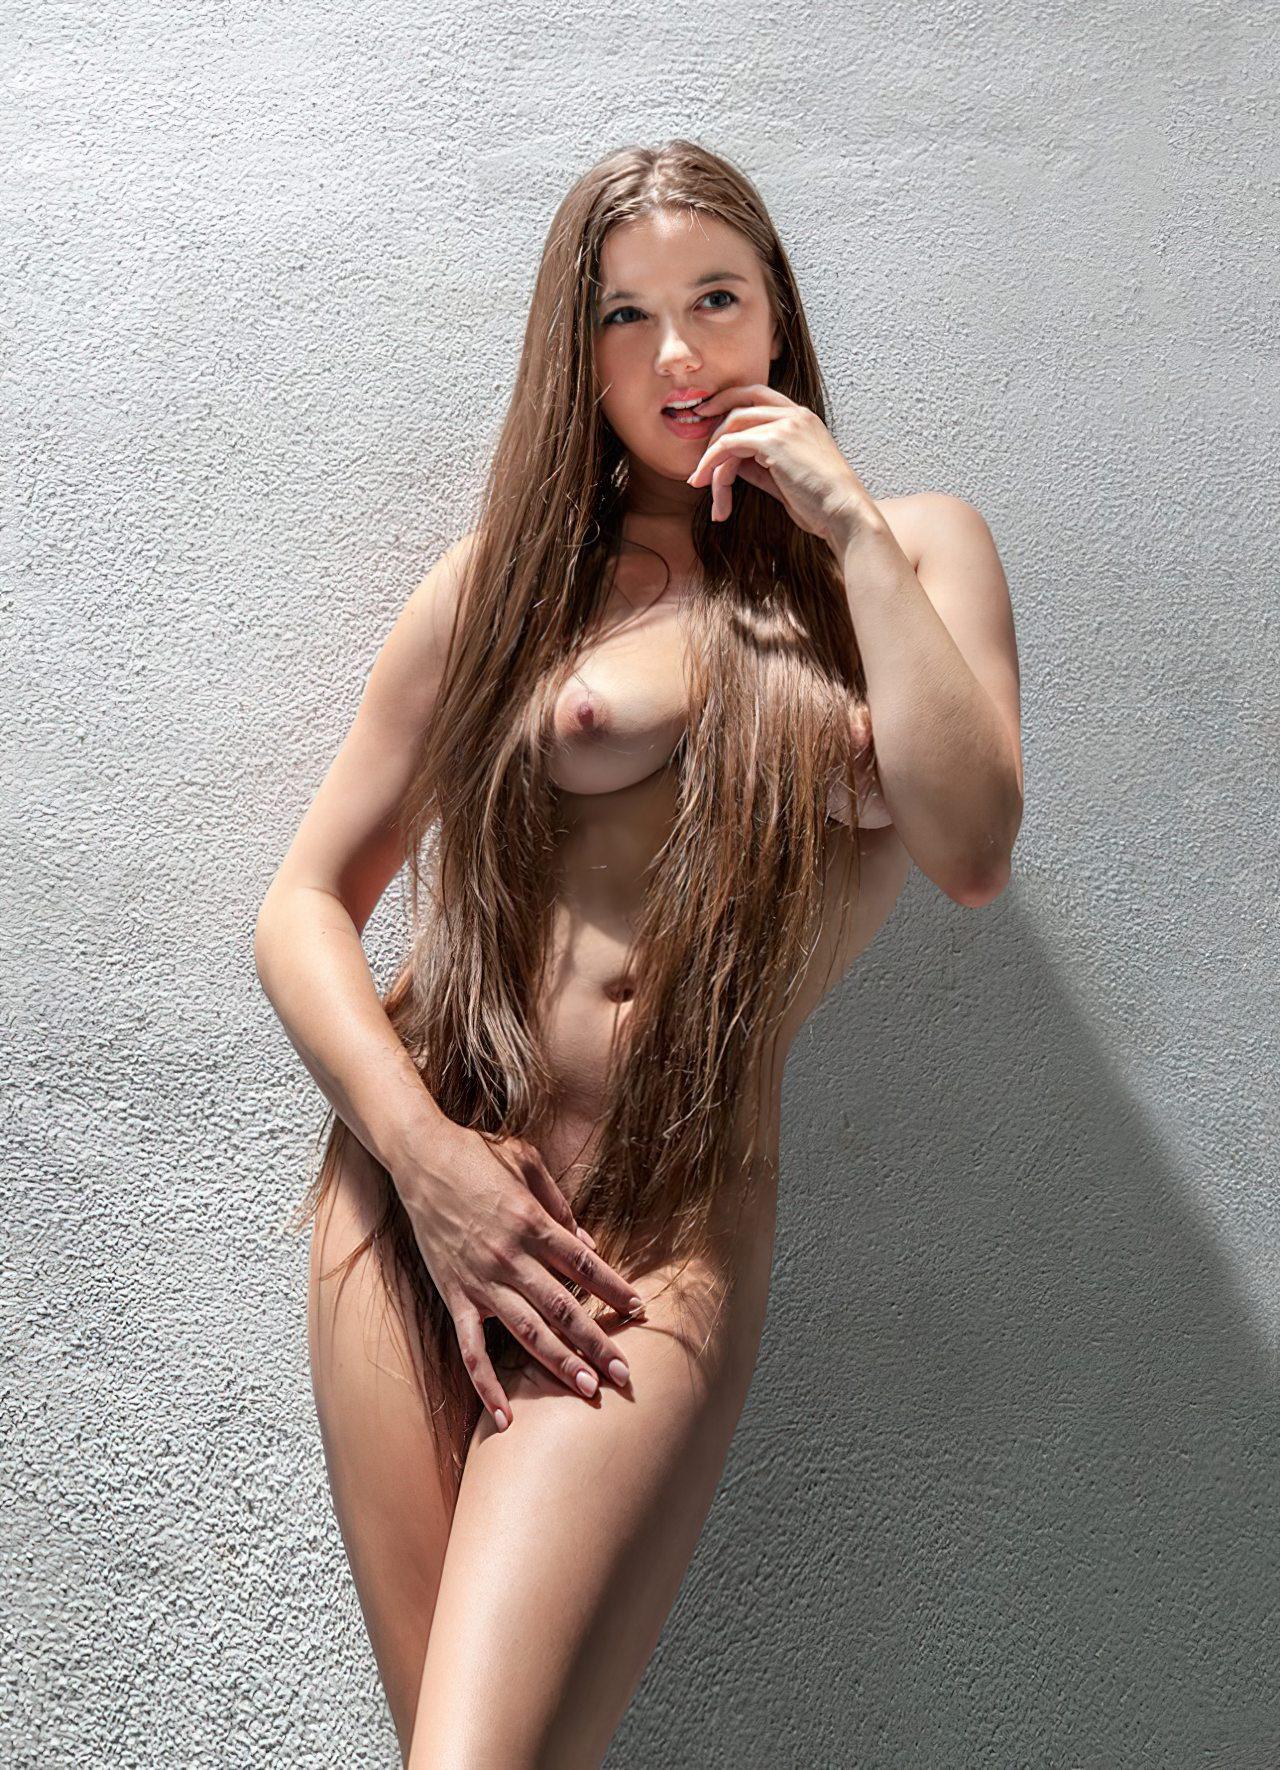 Fotos de Mulheres Despidas (36)